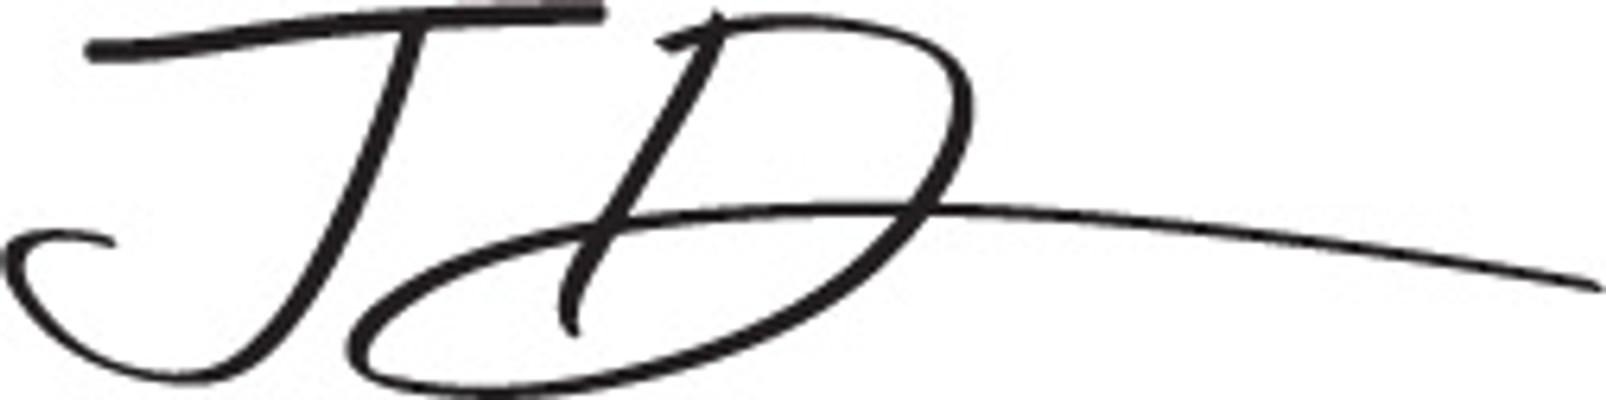 f0009-03